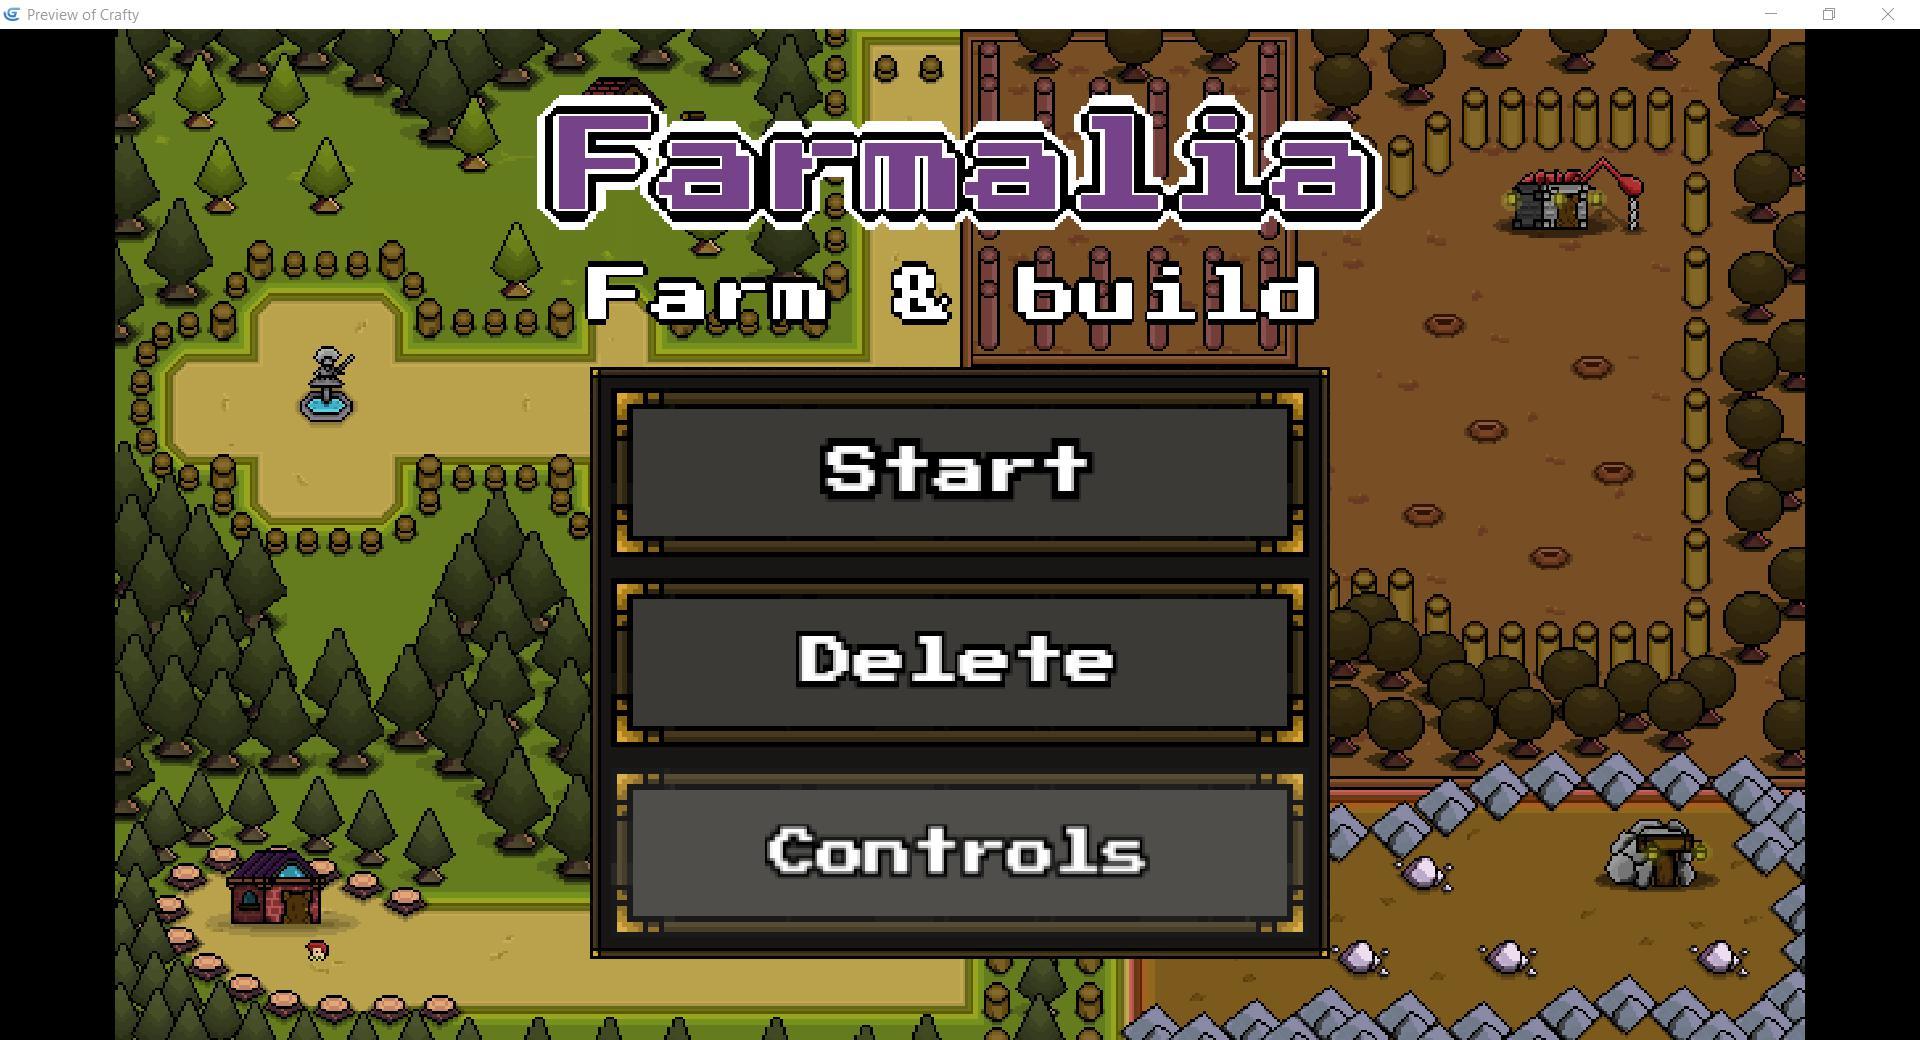 GDevelop - Farmalia - Farm & Build GDevelop 5 template